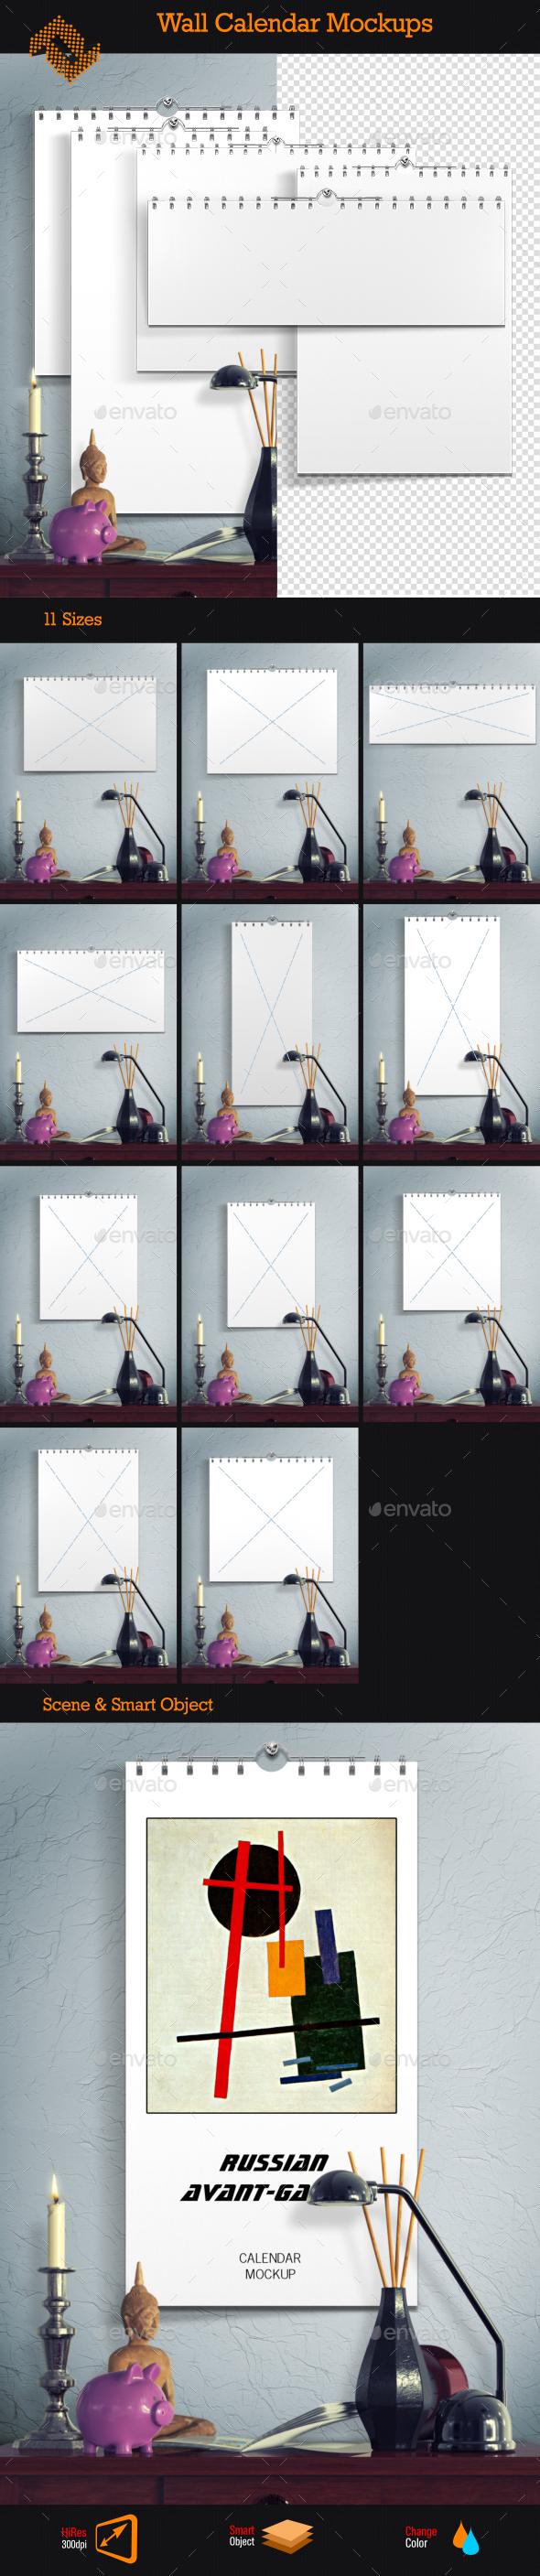 GraphicRiver Wall Calendar Mockups 9309963